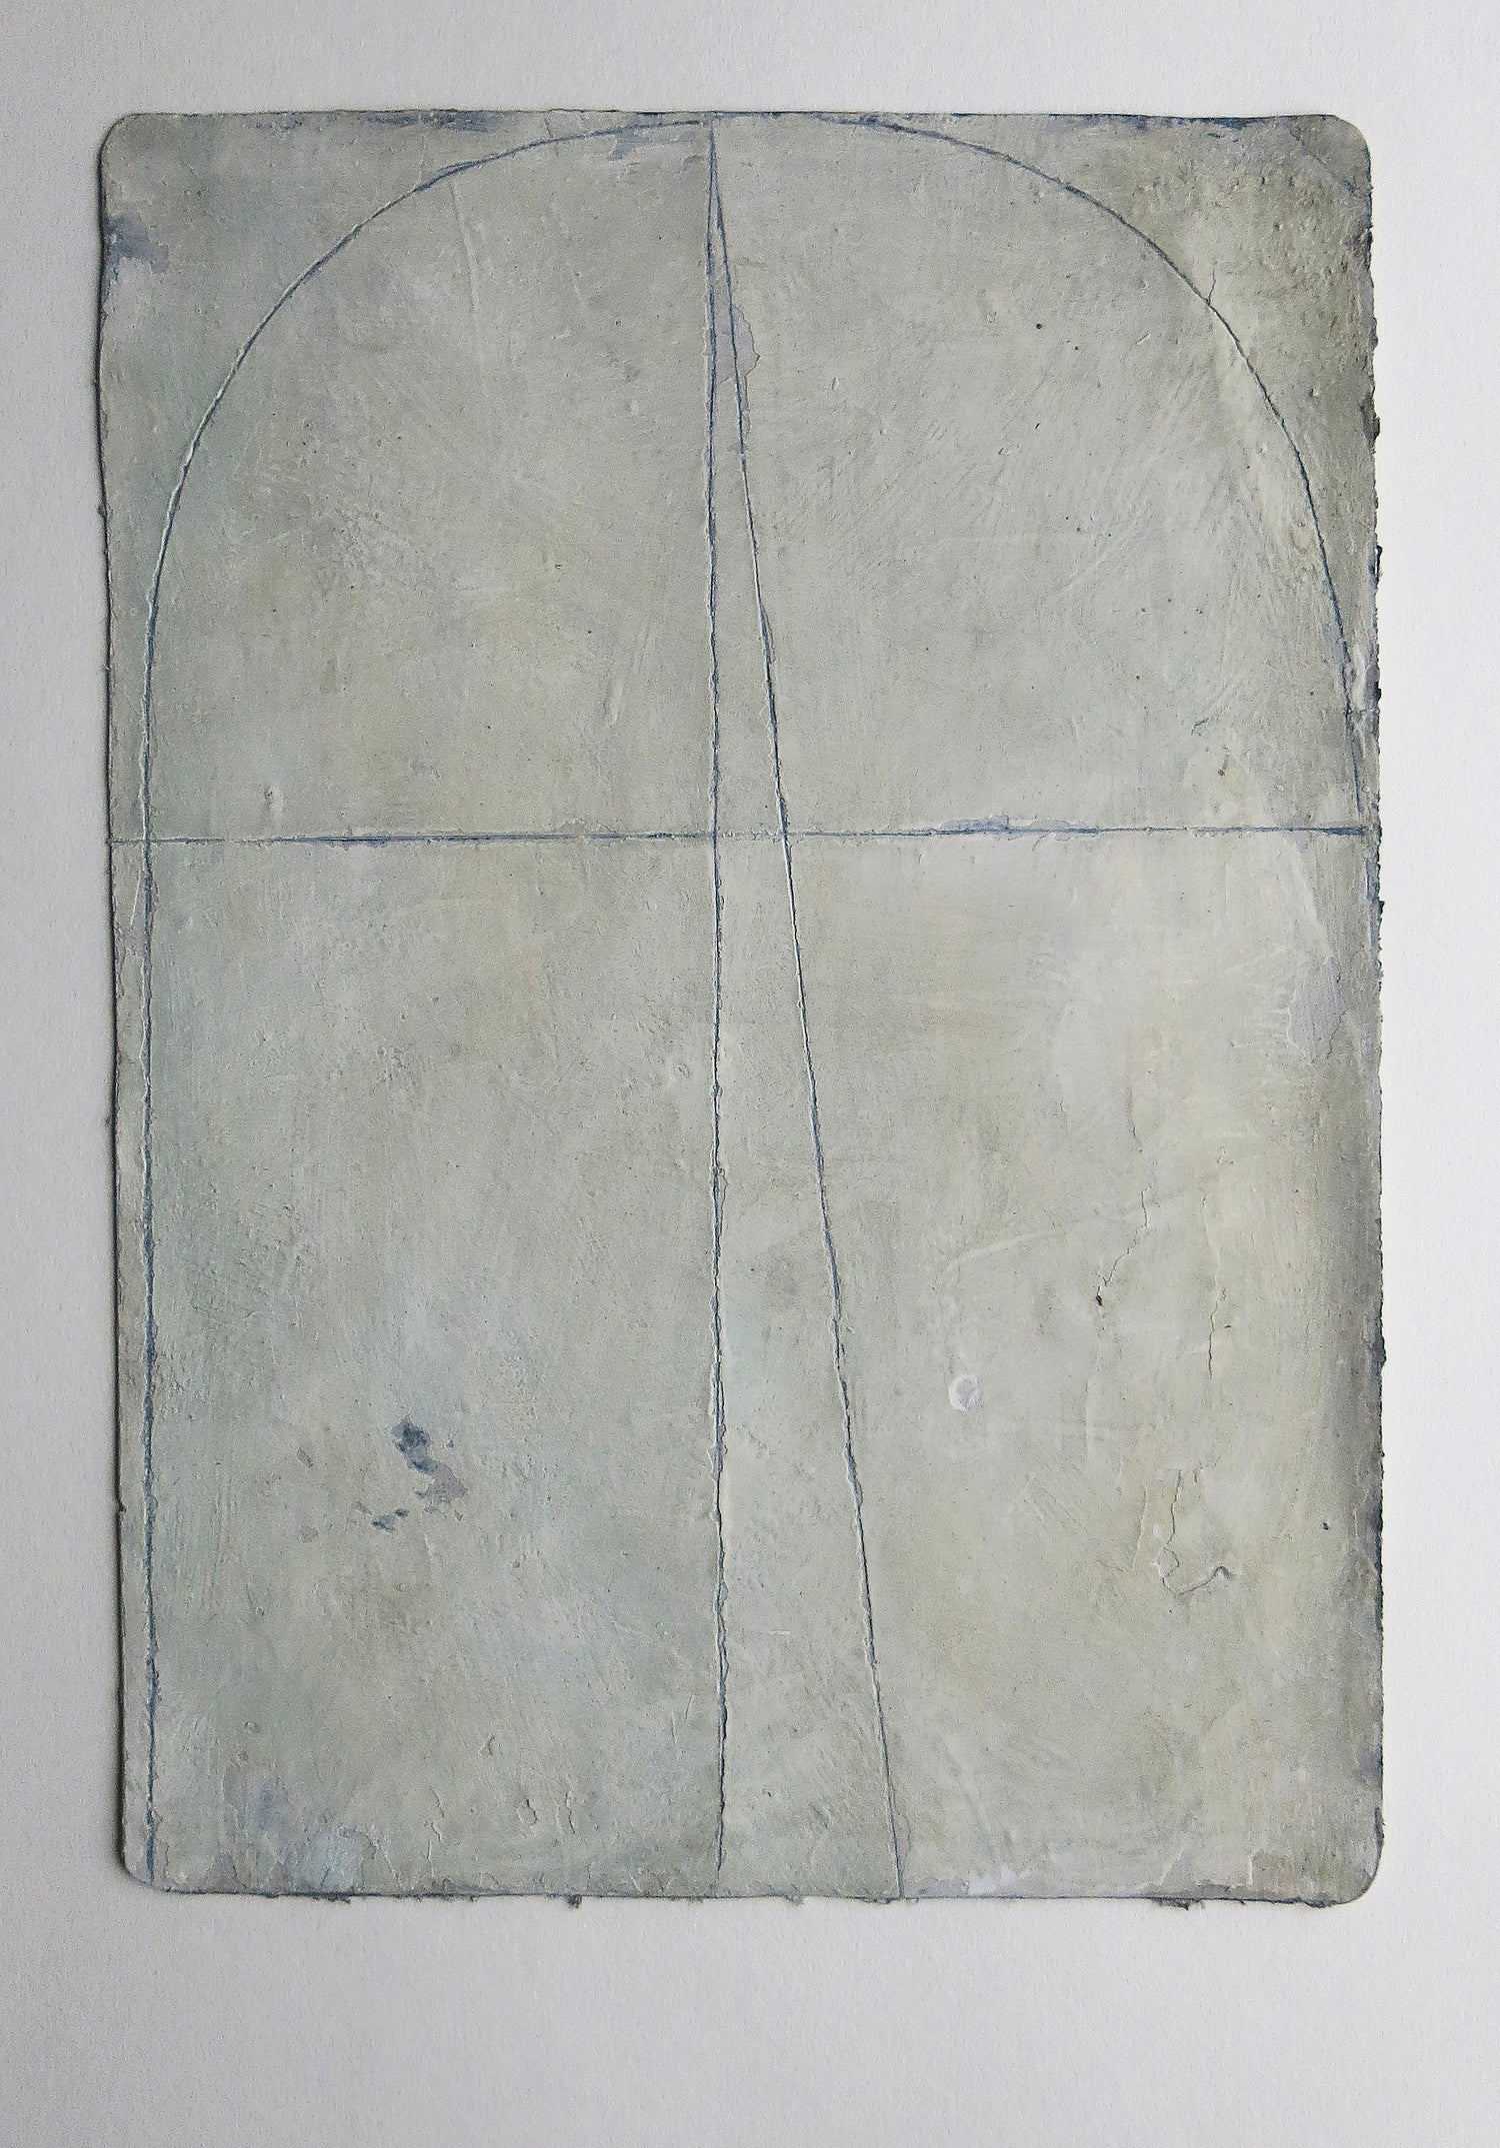 UNIVERSAL, Mark Houghton (2021)